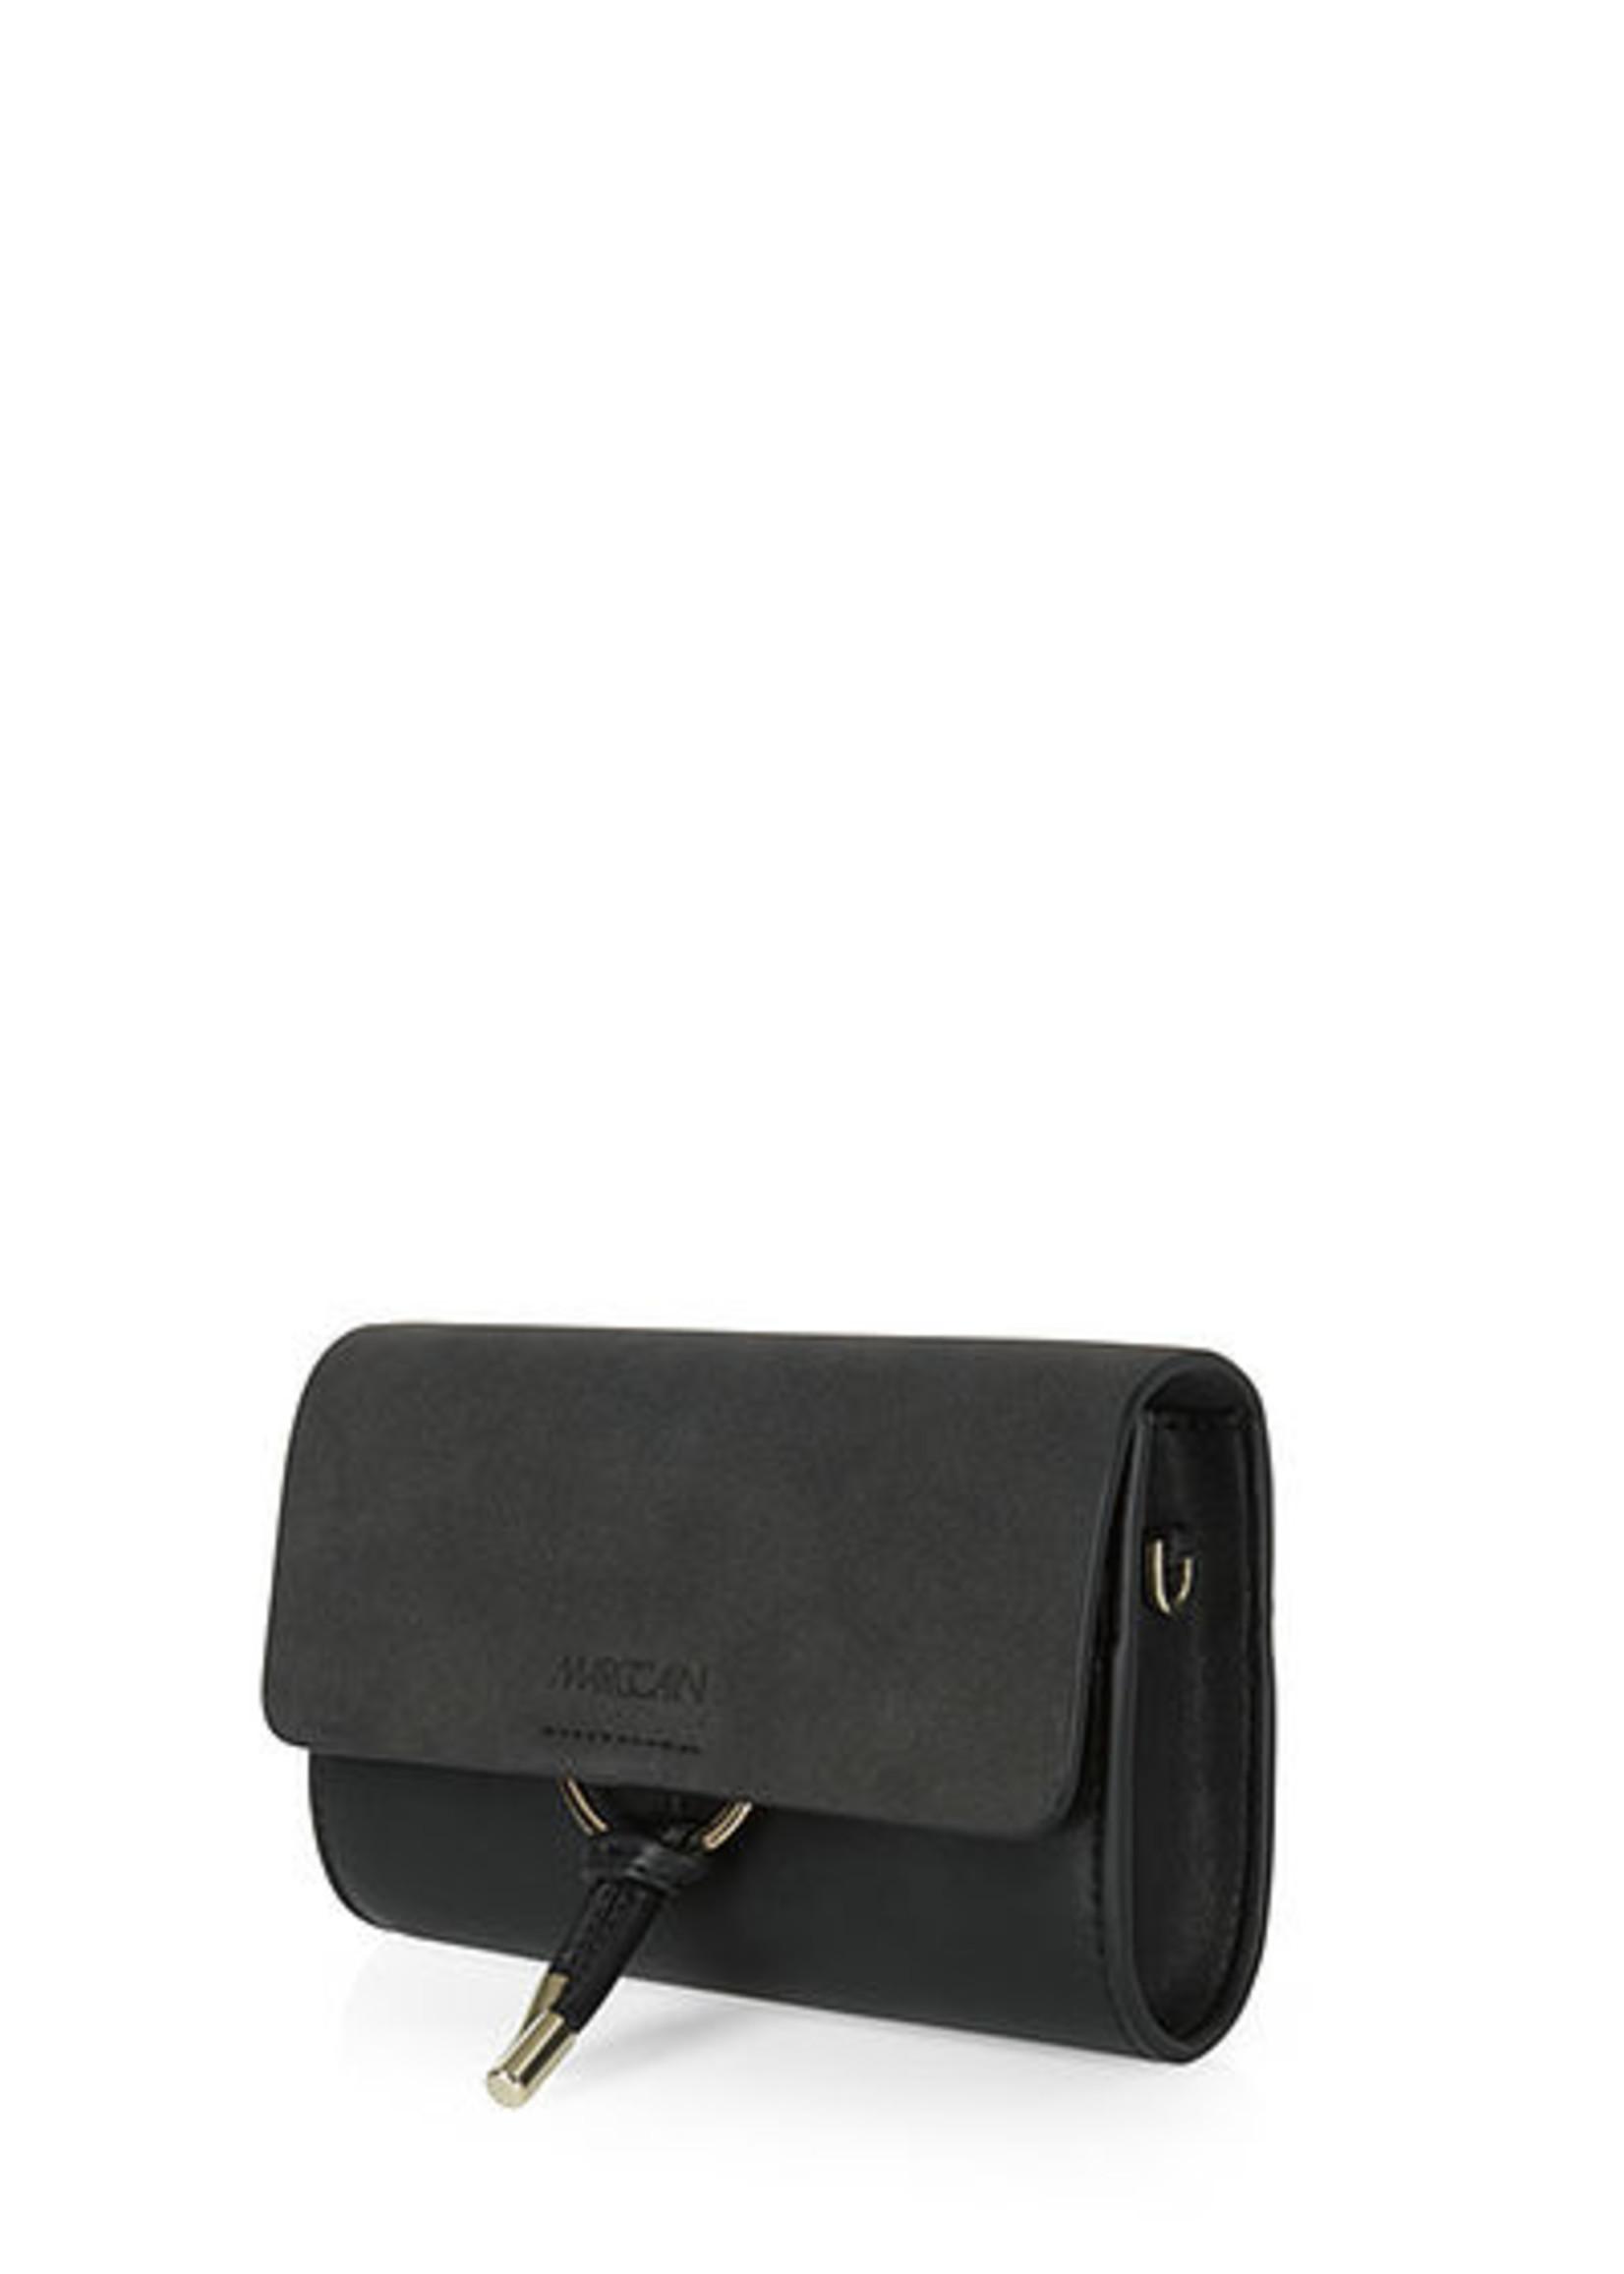 Marccain Bags & Shoes Shopper RB TI.10 Z015 black